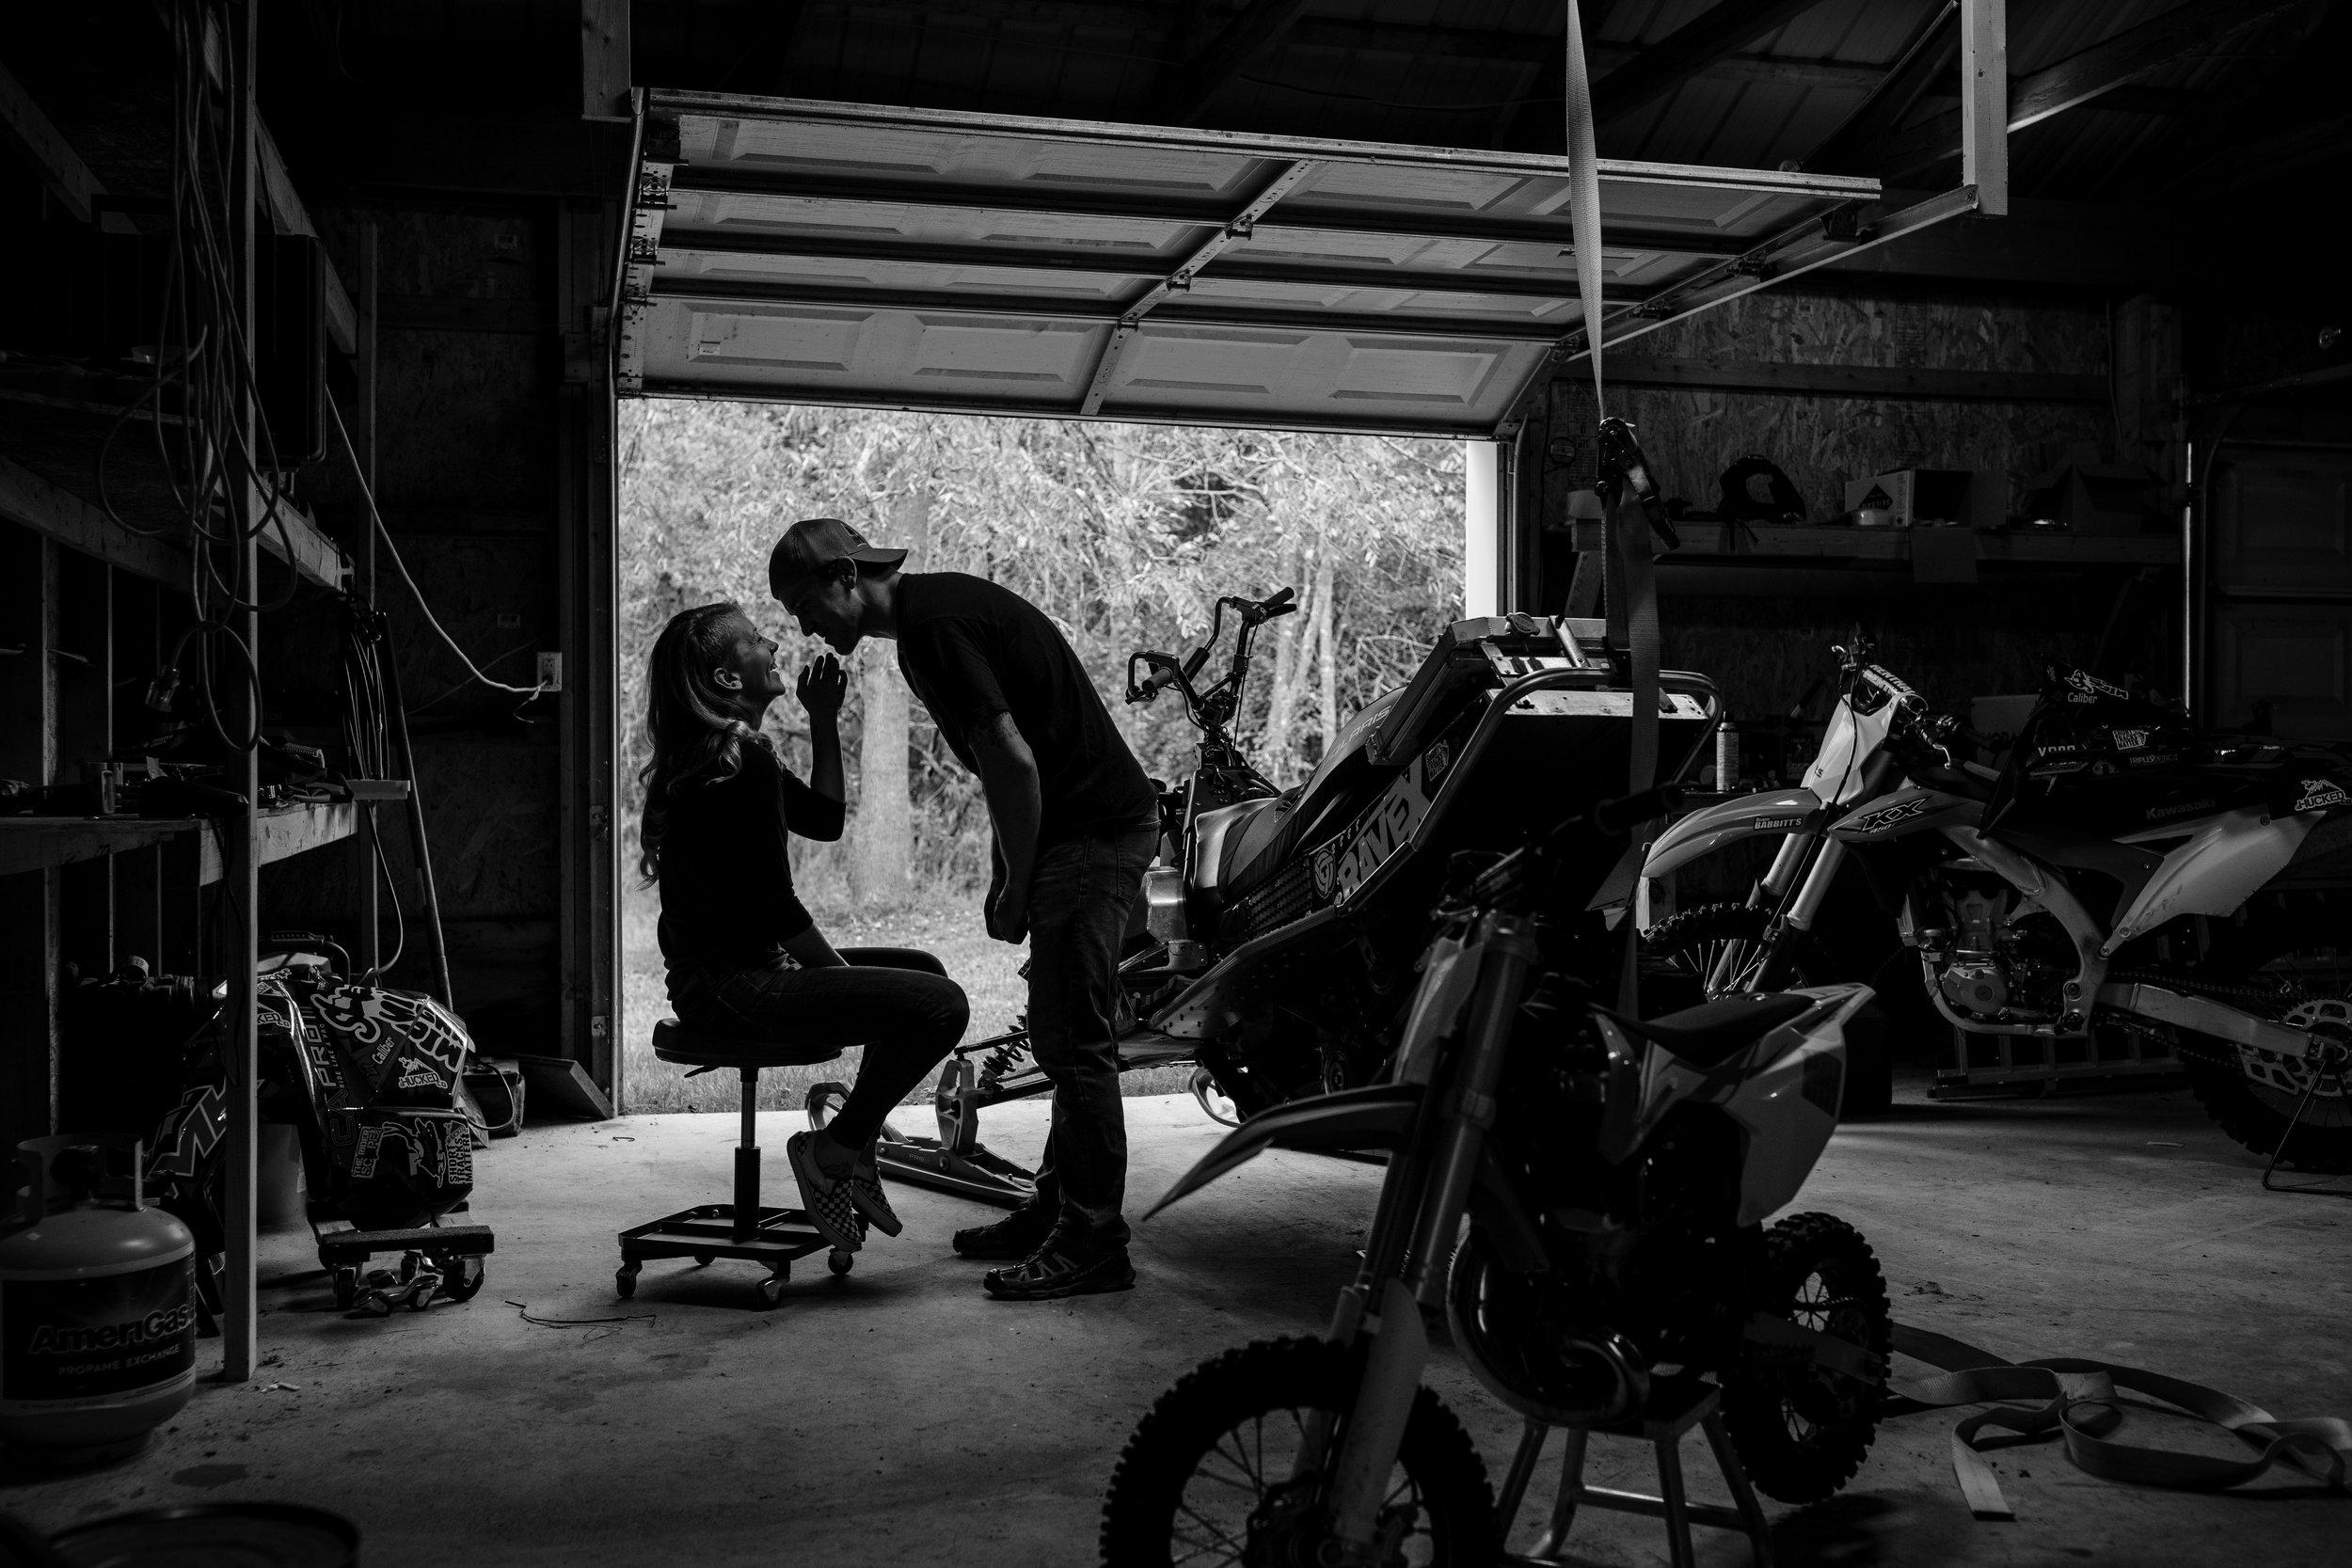 michigan-emotive-photographer-jessicamax-2.jpg